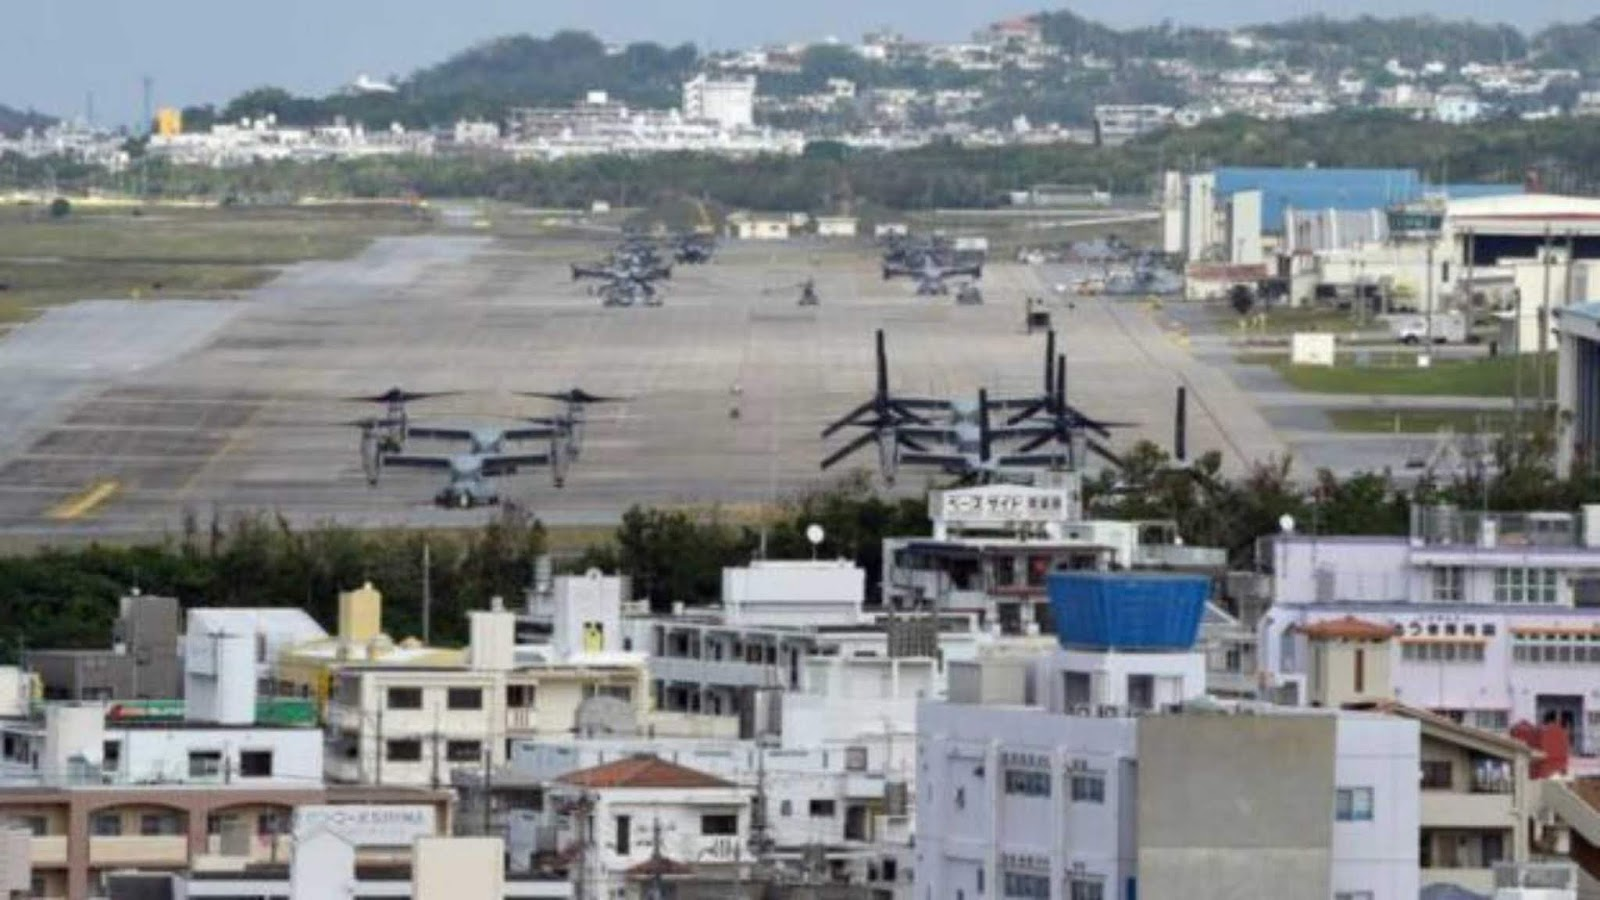 Jepang akan melanjutkan pembuatan pangkalan AS meski warganya menentang